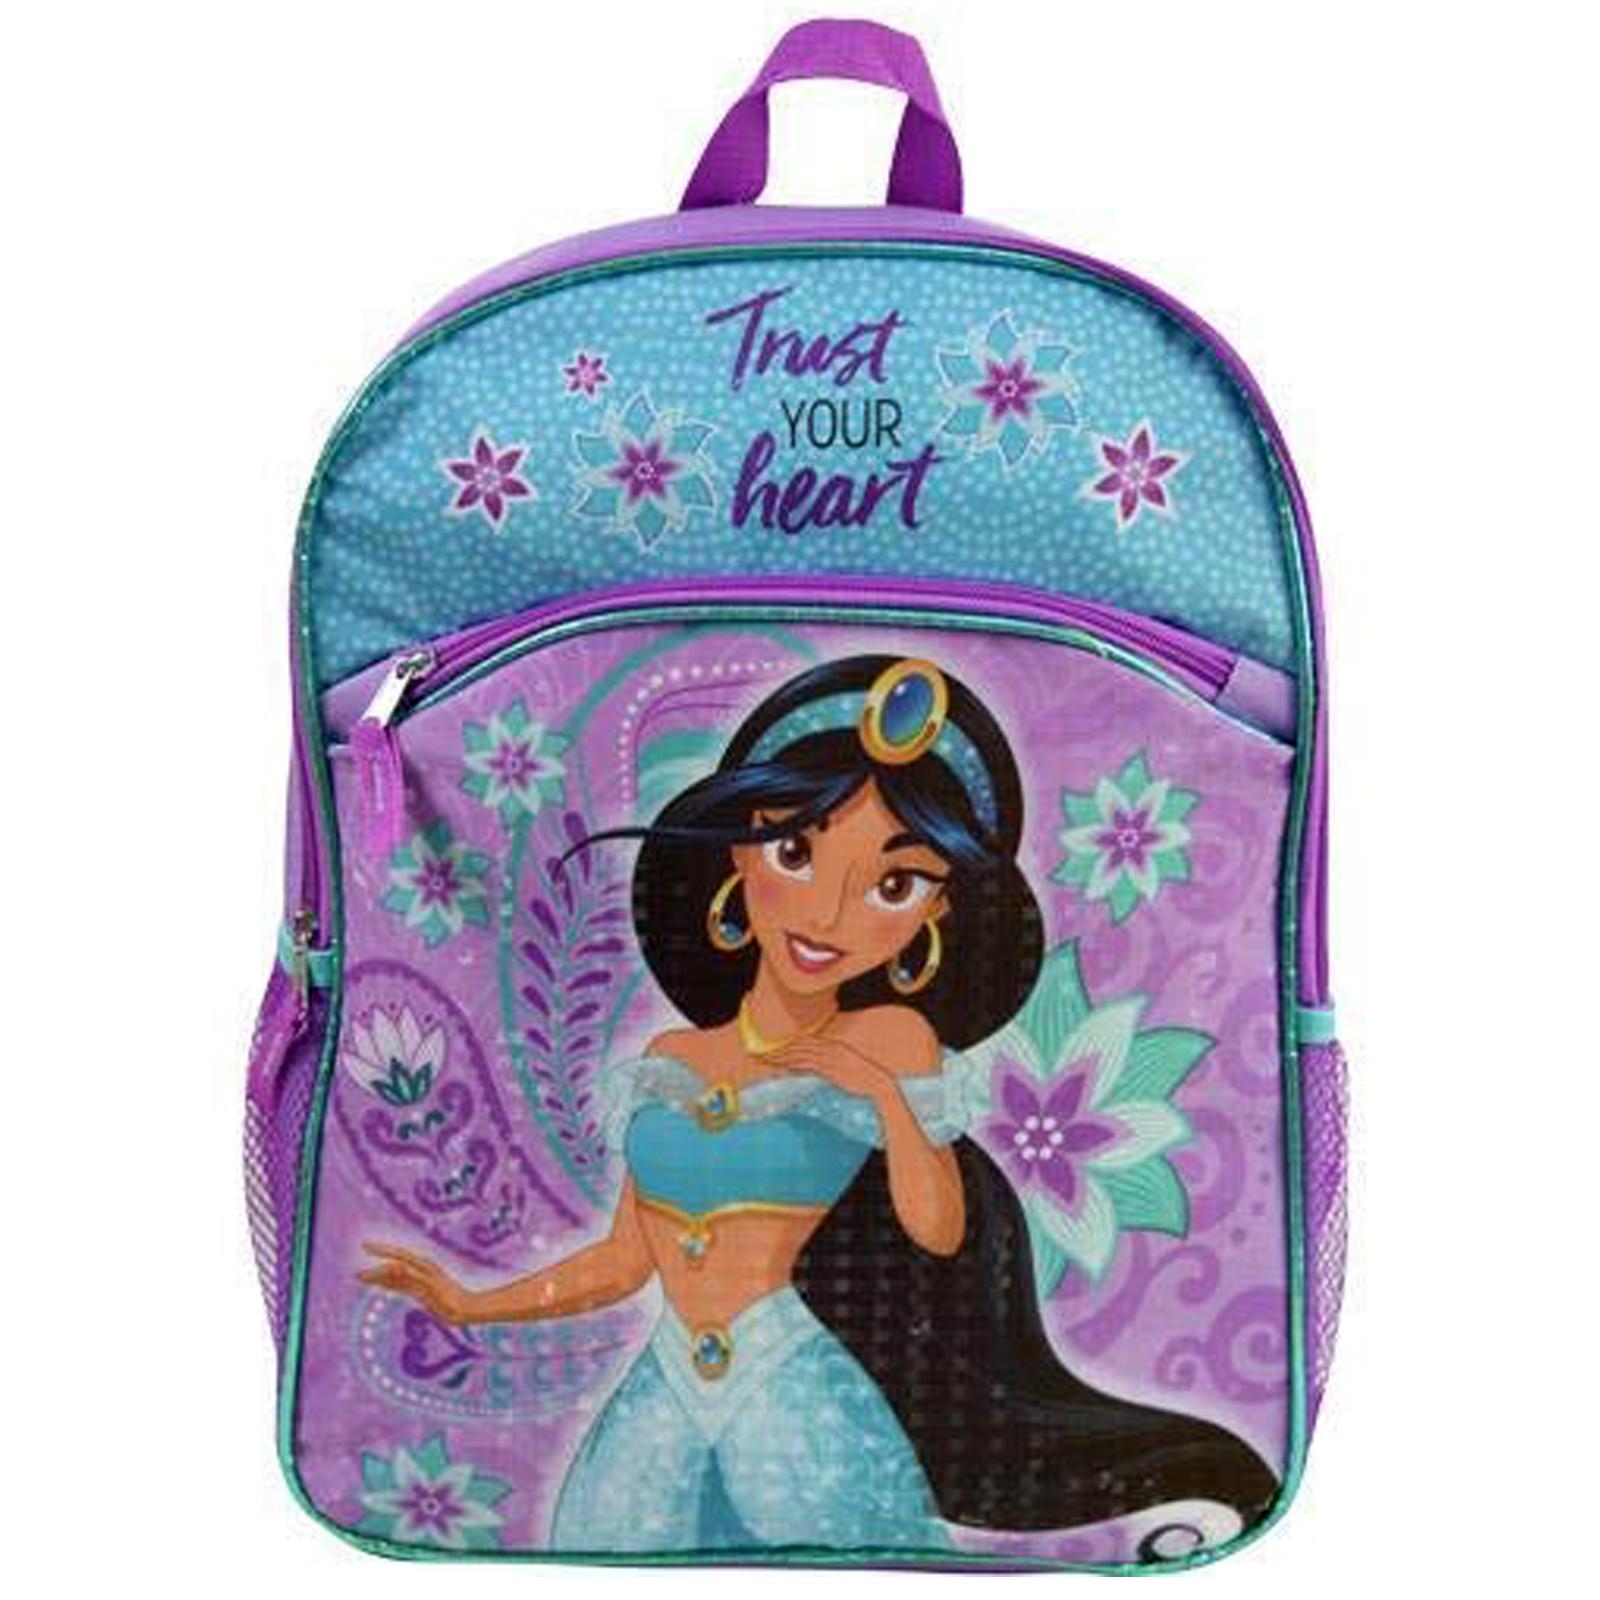 19a3a261193 Disney Aladdin Princess Jasmine Girls School Backpack Mesh Pockets Travel  Bag